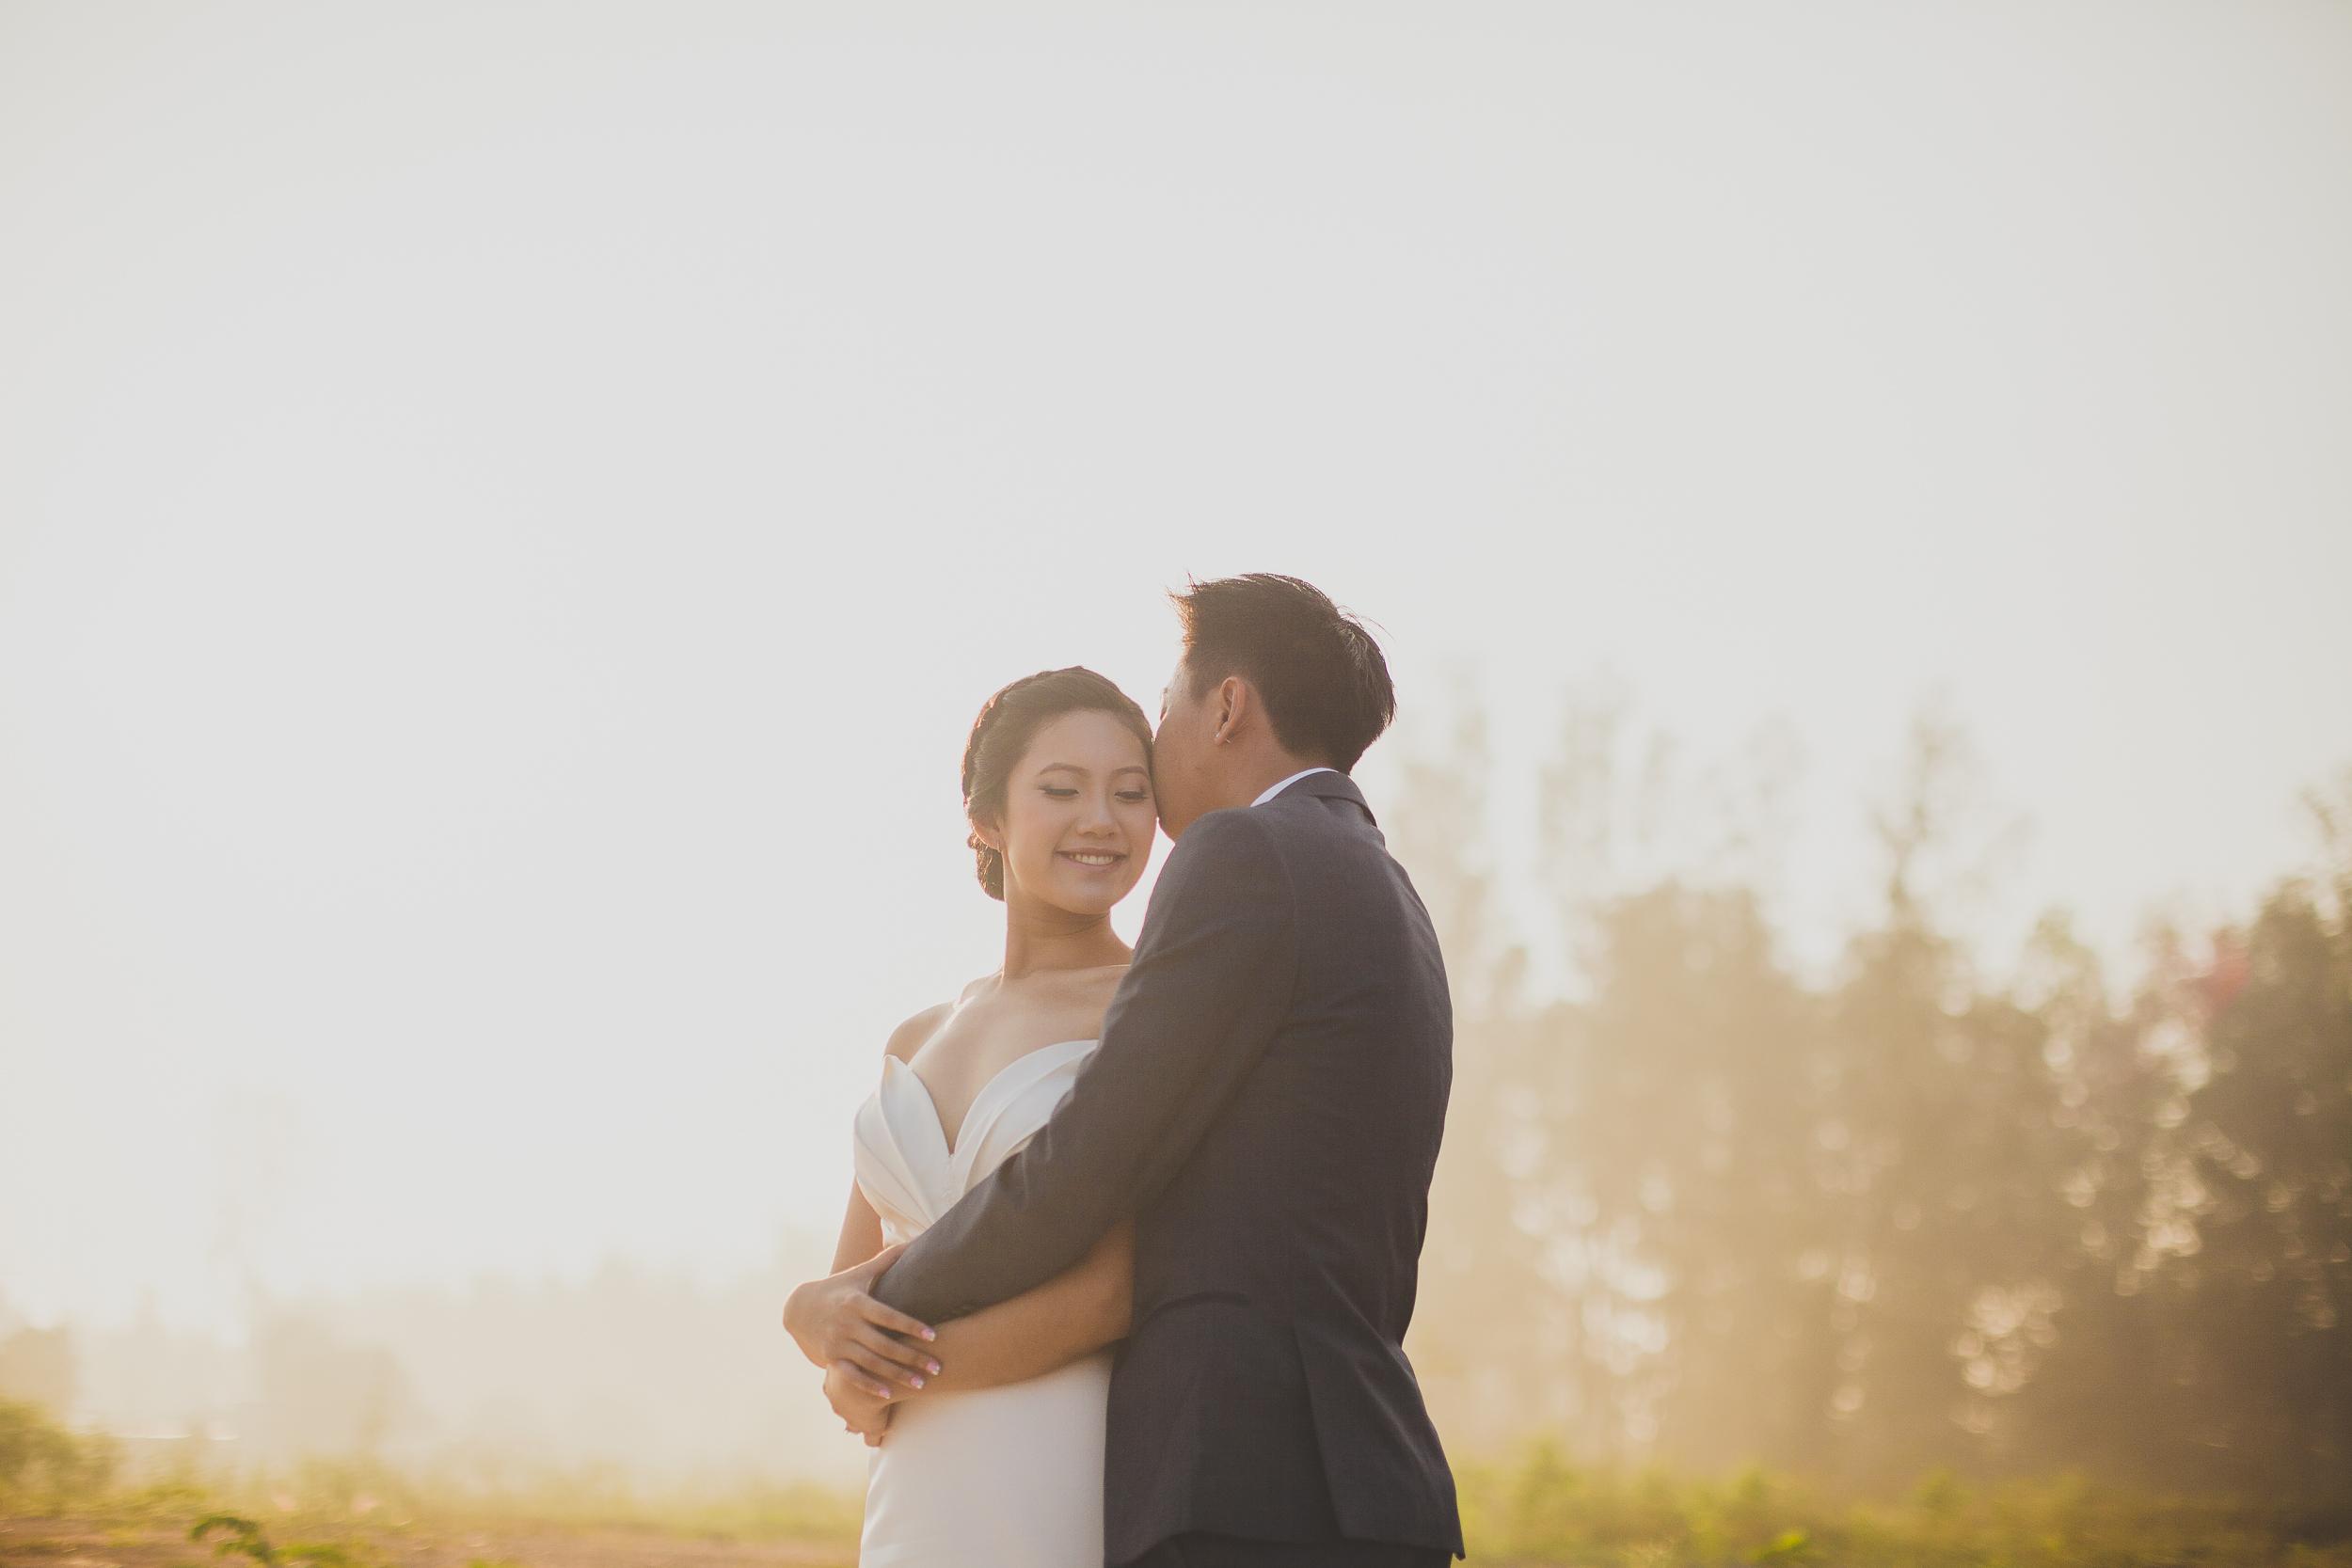 Singapore+Pre+Wedding+Photographer+Ziyang+Clara-0007.jpg